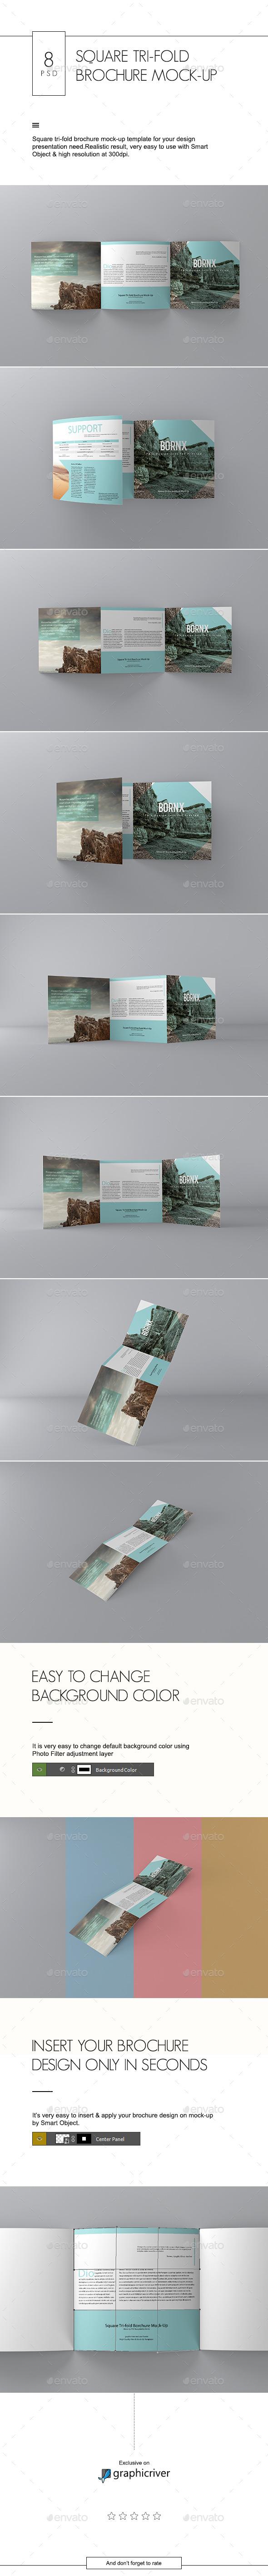 Square Tri-fold Brochure Mock-Up - Brochures Print